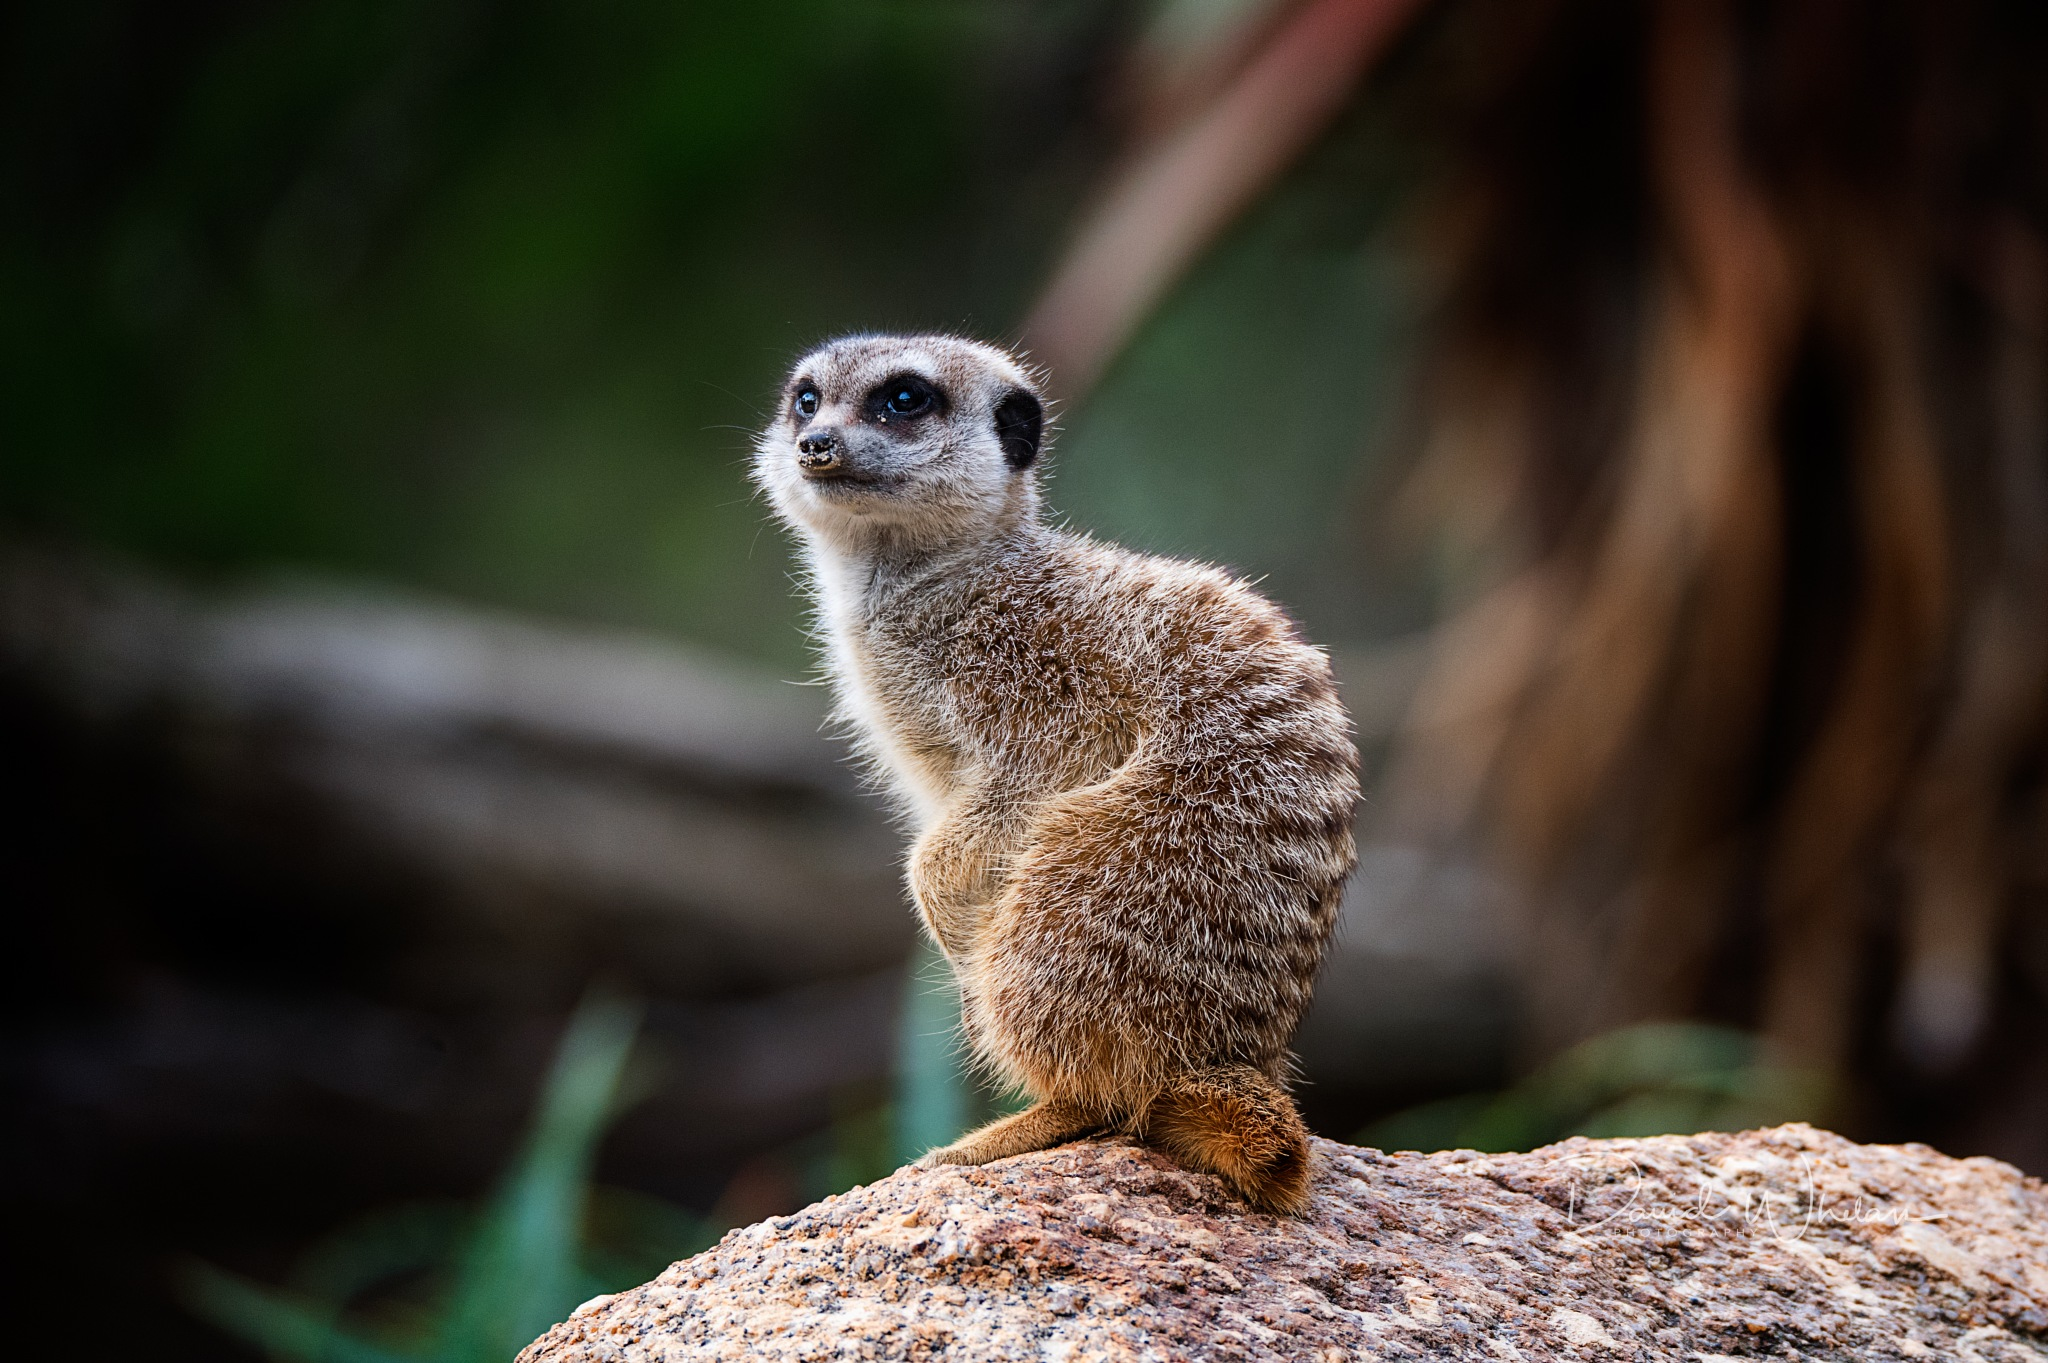 Baby Meerkat by David Whelan